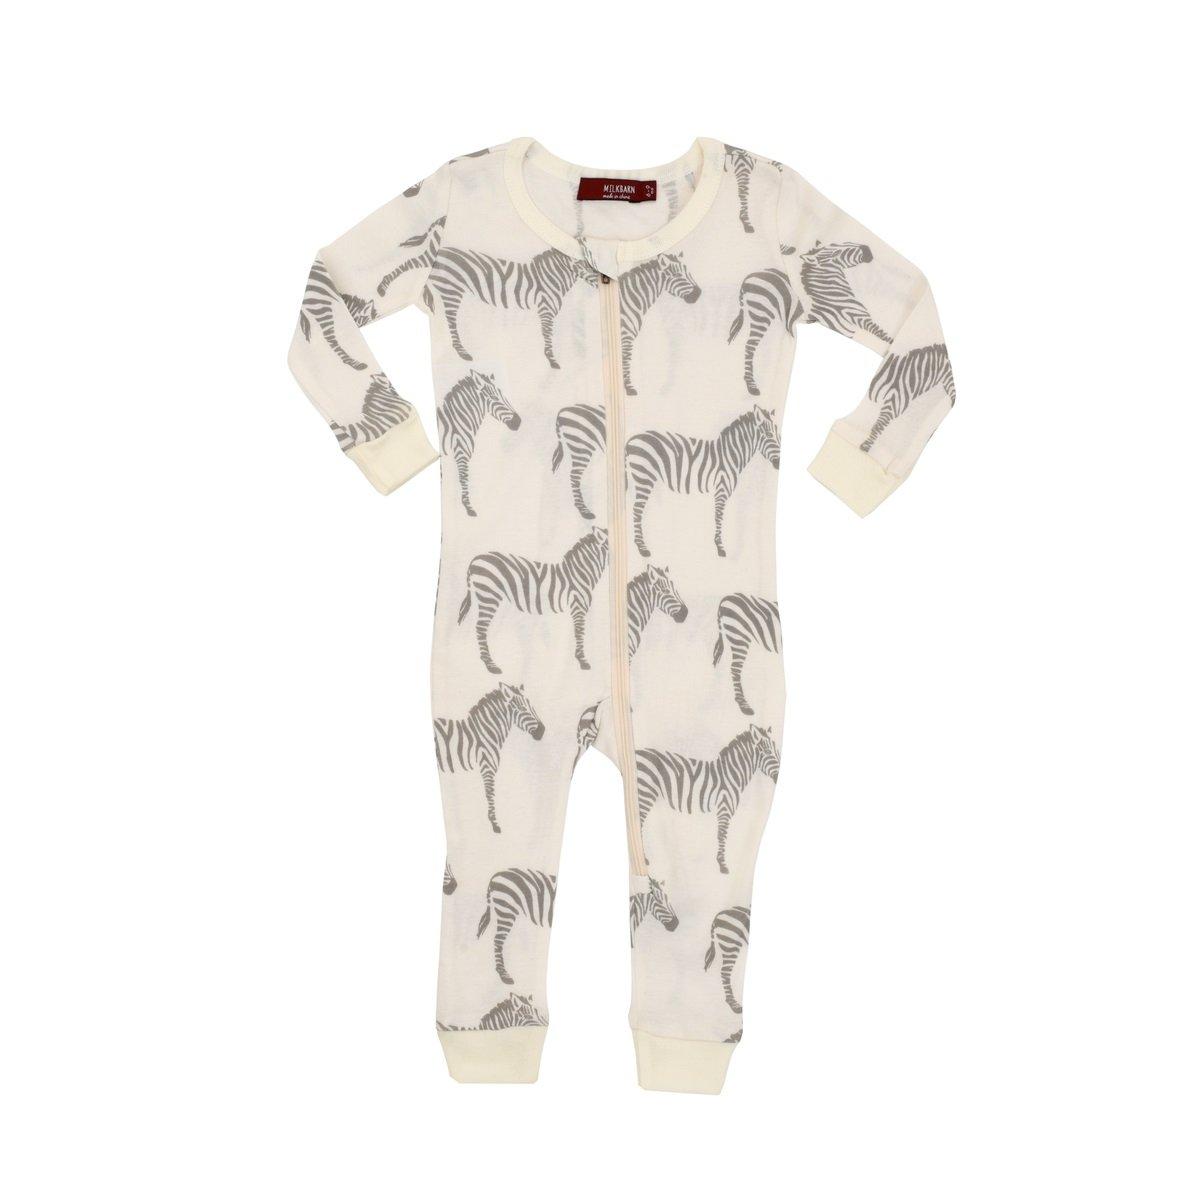 MilkBarn Organic Cotton Zipper Pajama - Grey Zebra (12-18 Months) by MilkBarn